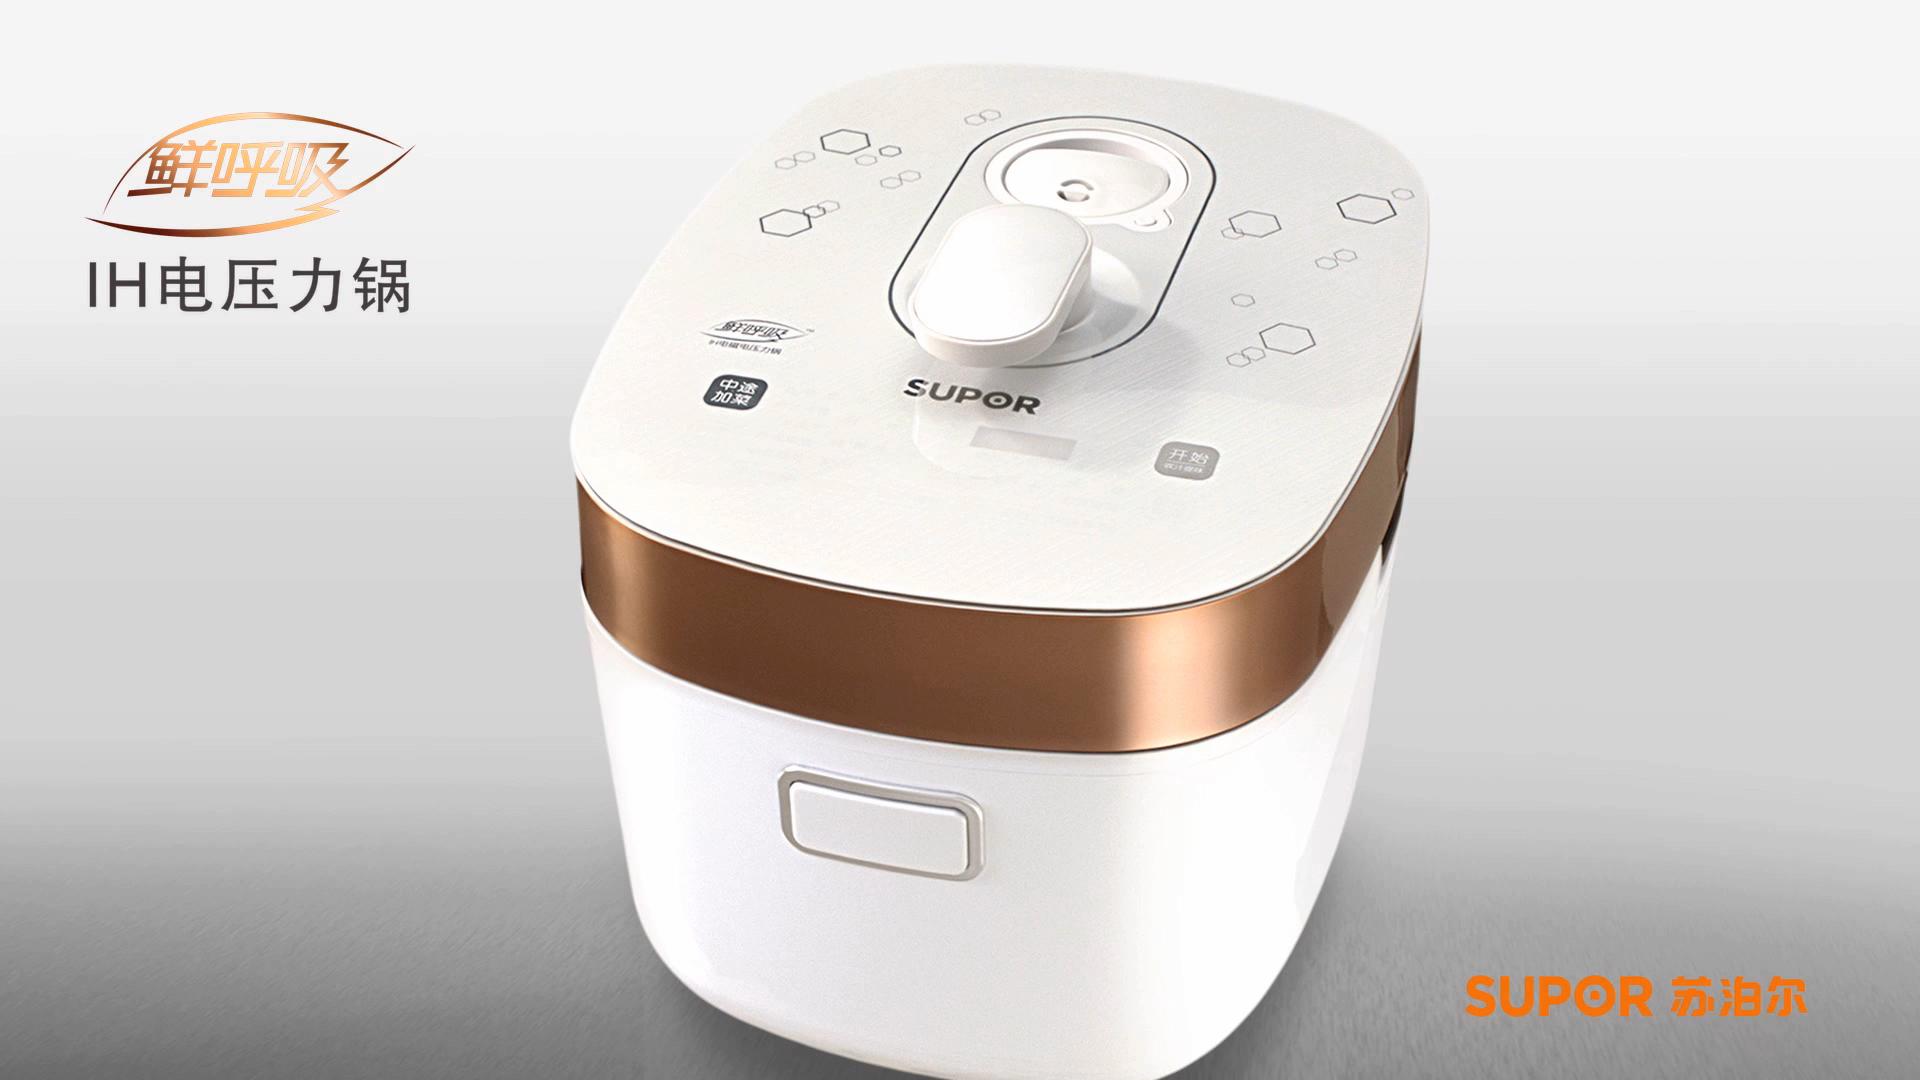 Supor - 鮮呼吸IH電壓力鍋 30sec TVC